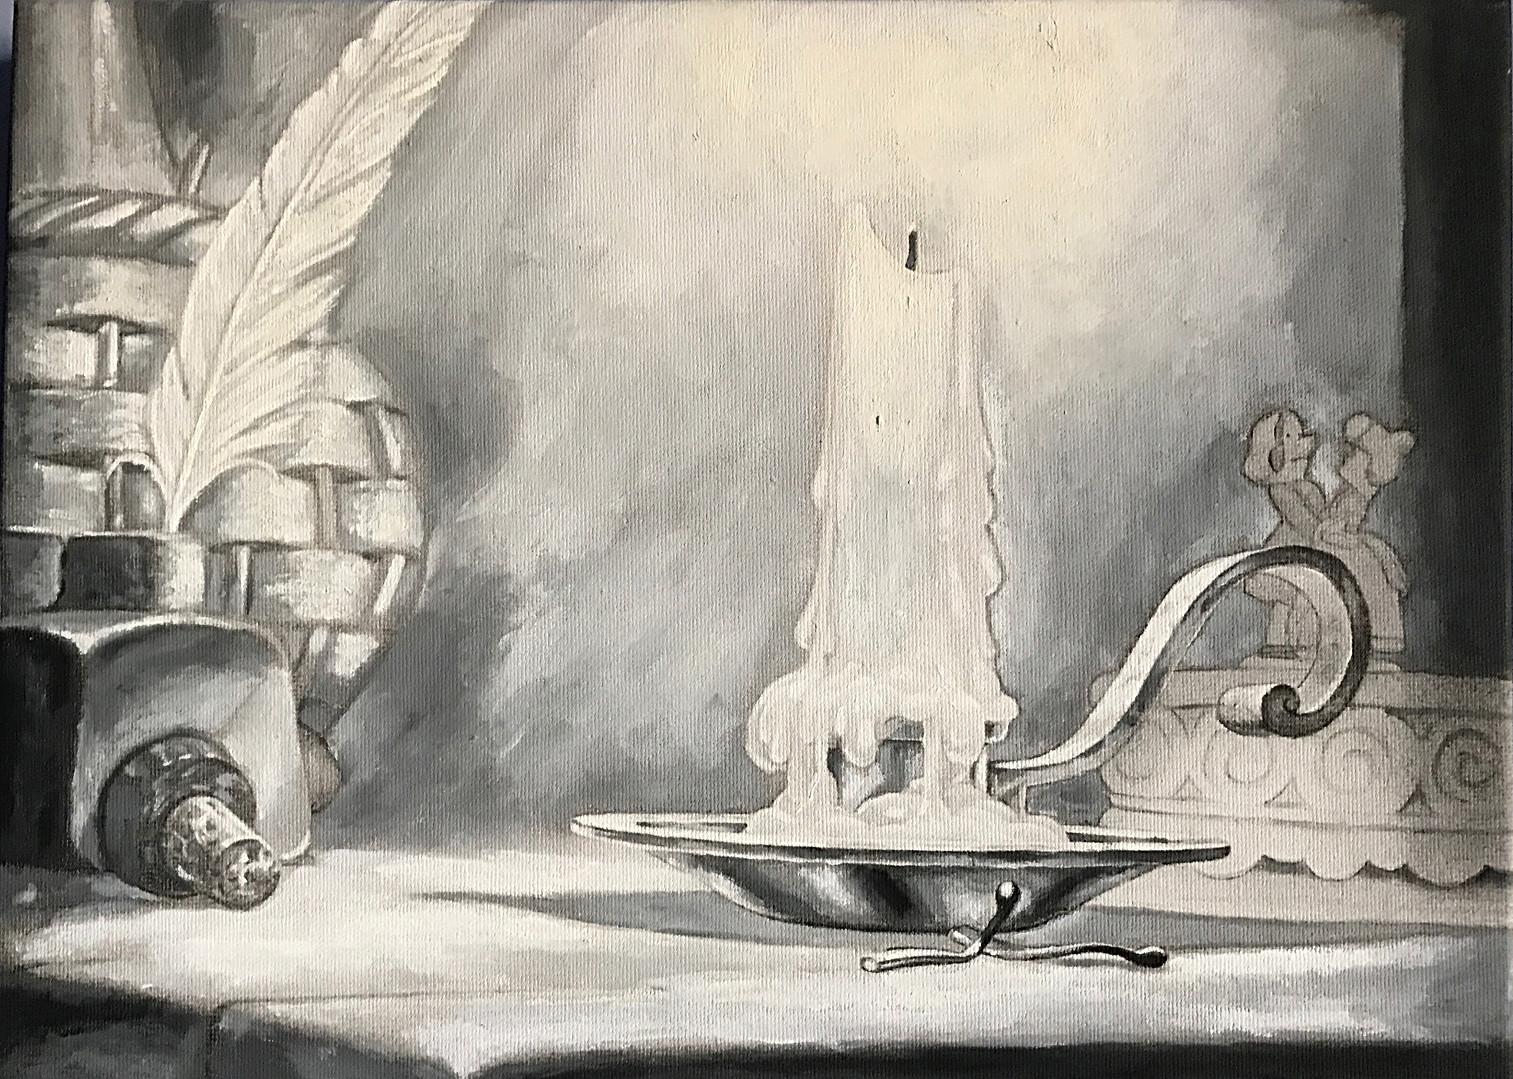 Pinnochio Candle